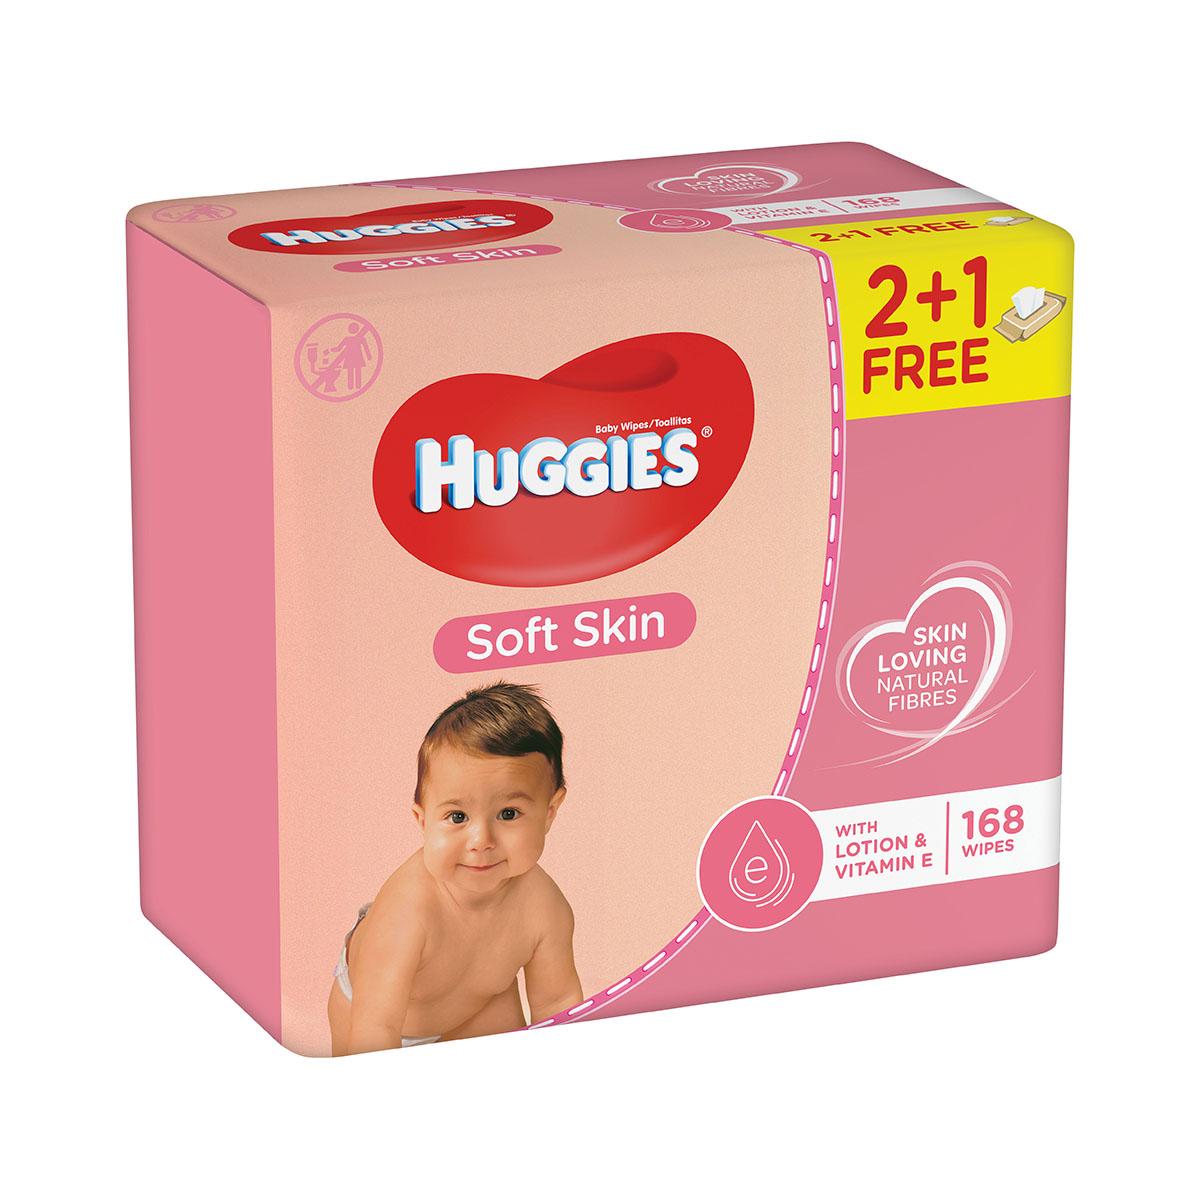 Servetele umede Huggies Soft Skin, 2 + 1, 168 buc imagine